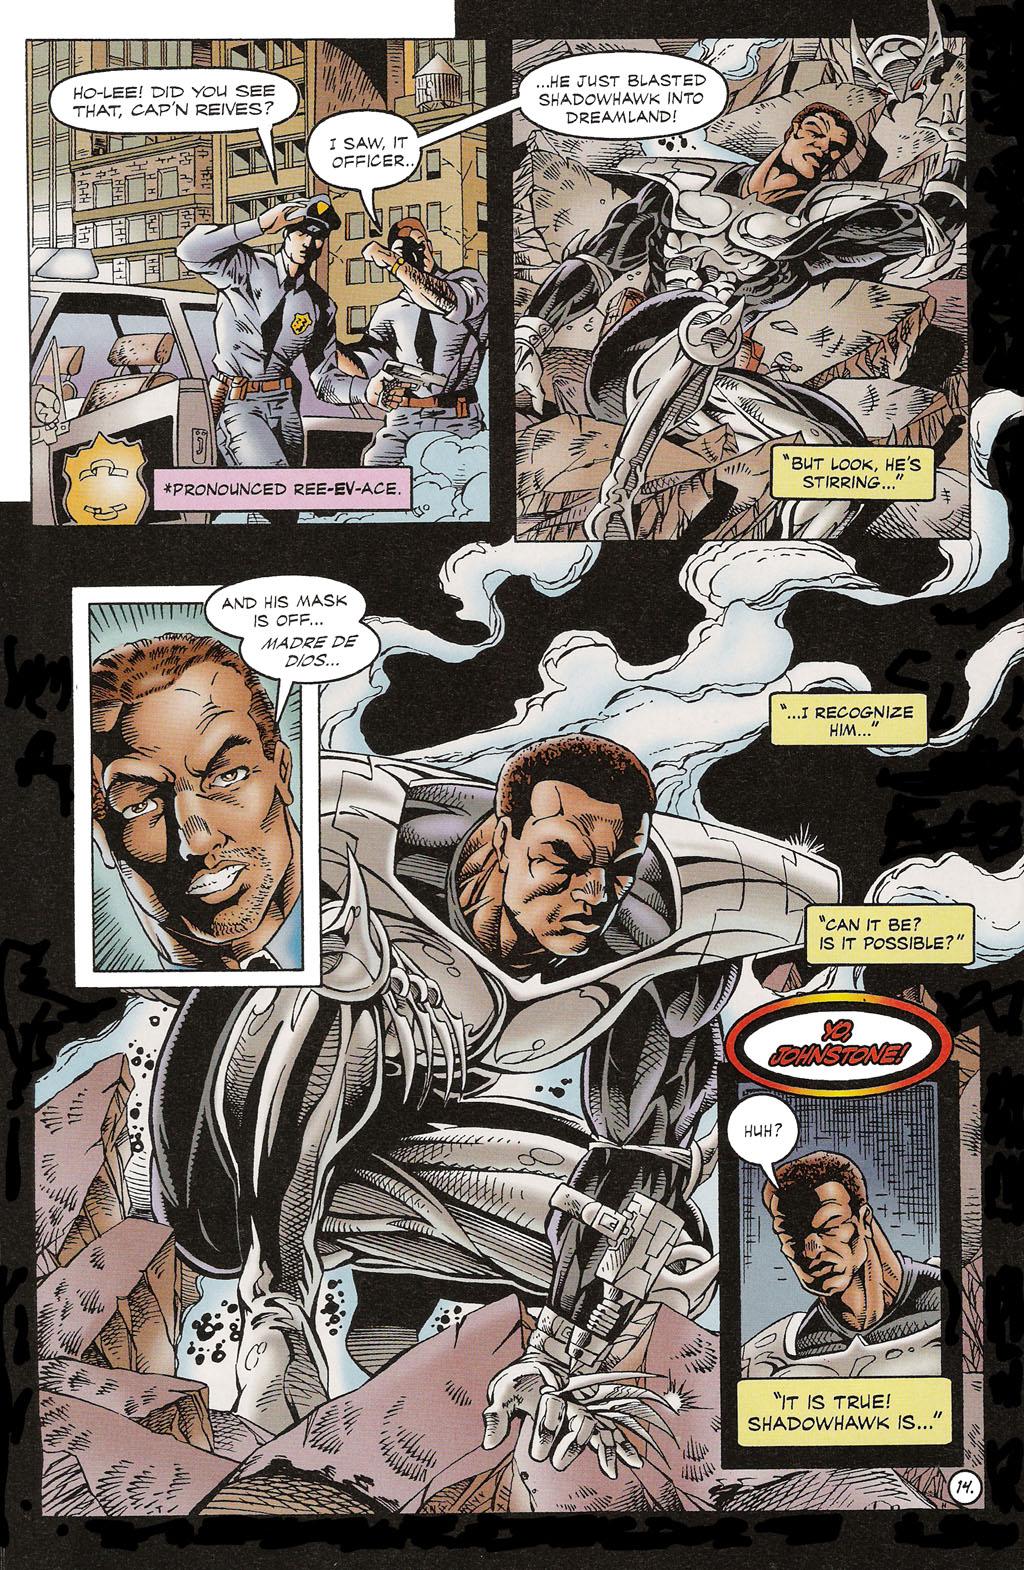 Read online ShadowHawk comic -  Issue #16 - 11